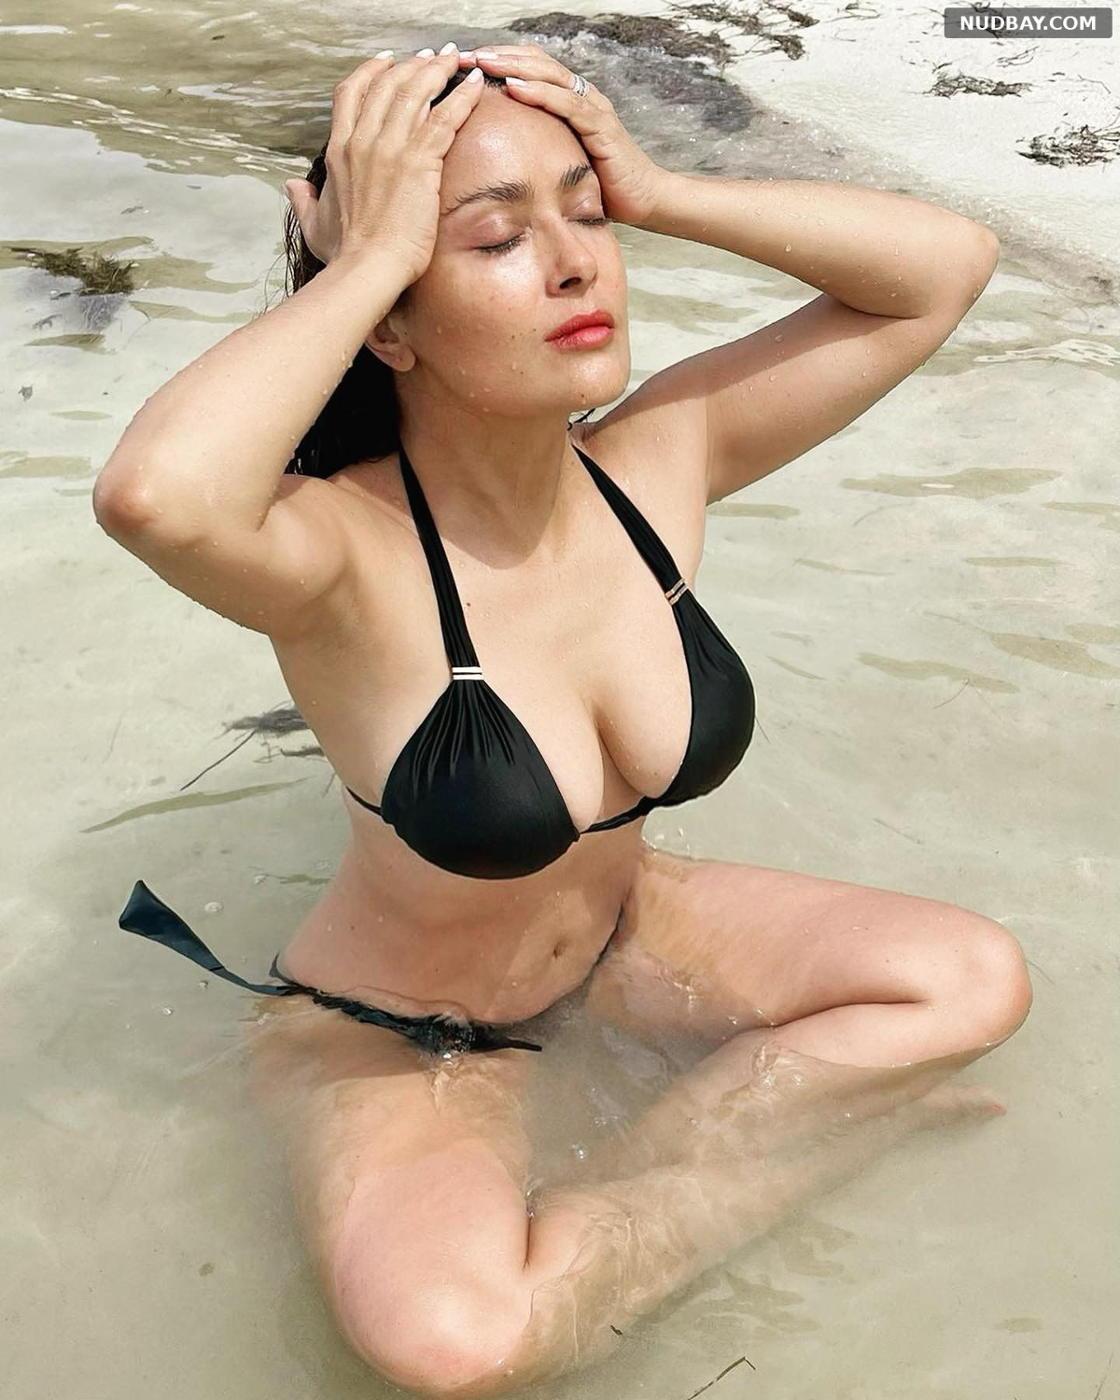 Salma Hayek in black bikini Jan 19 2021